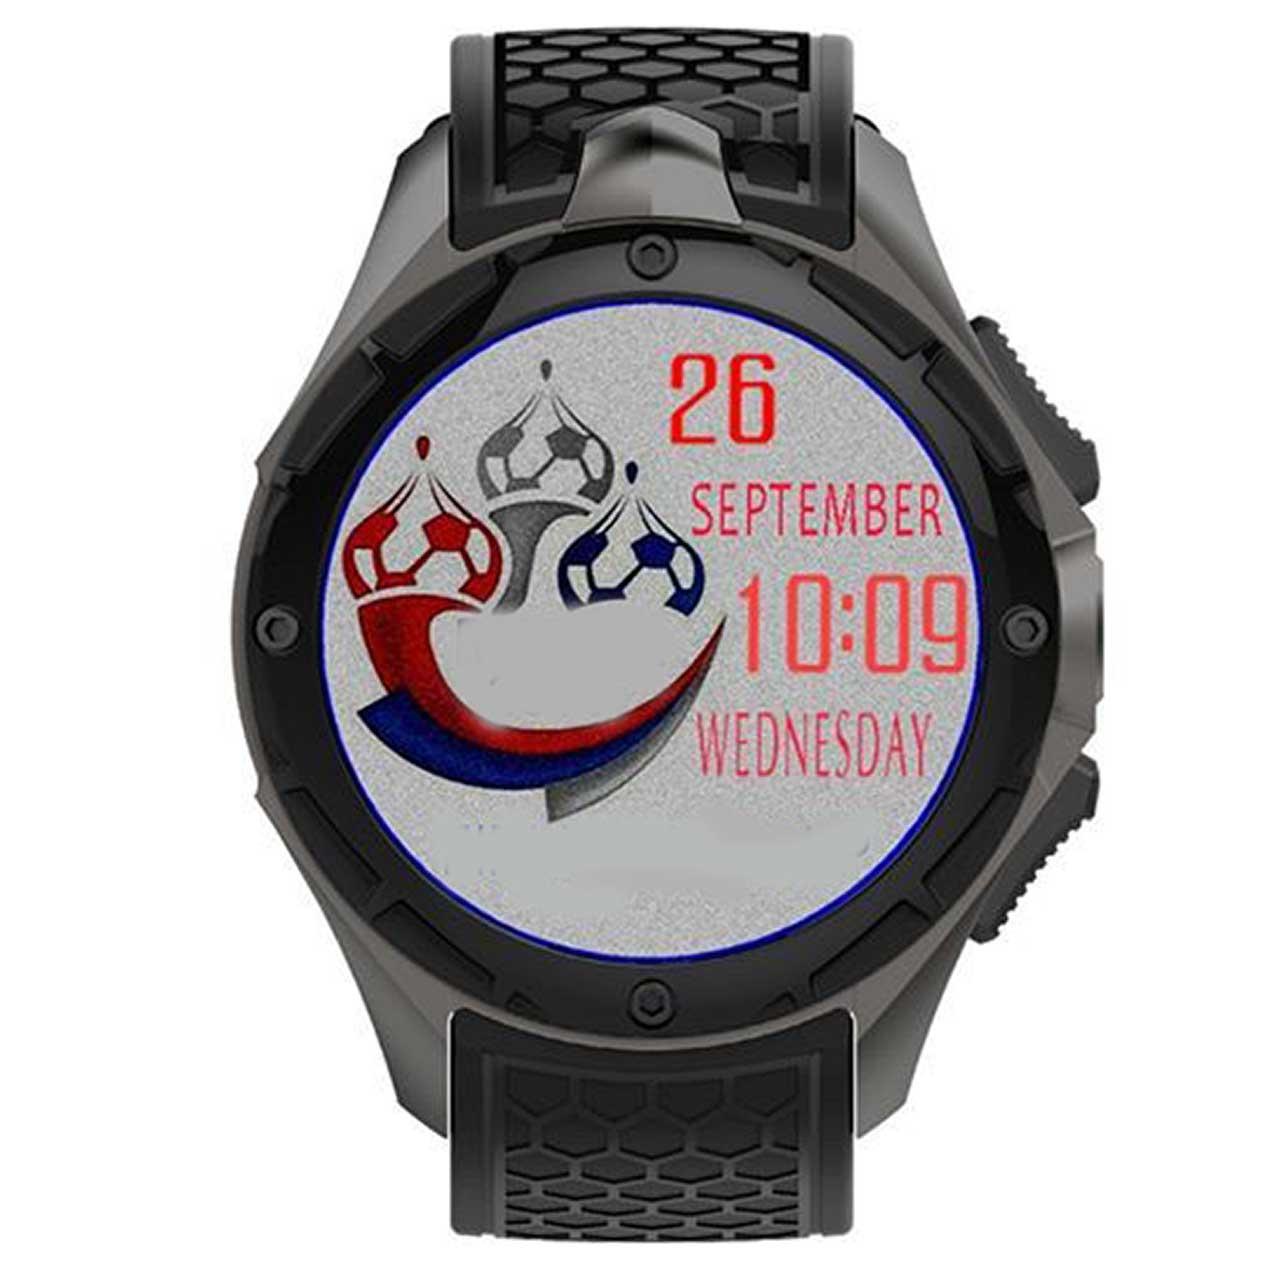 ساعت هوشمند کینگ ور مدل KW68  ورژن IP68 Waterproof